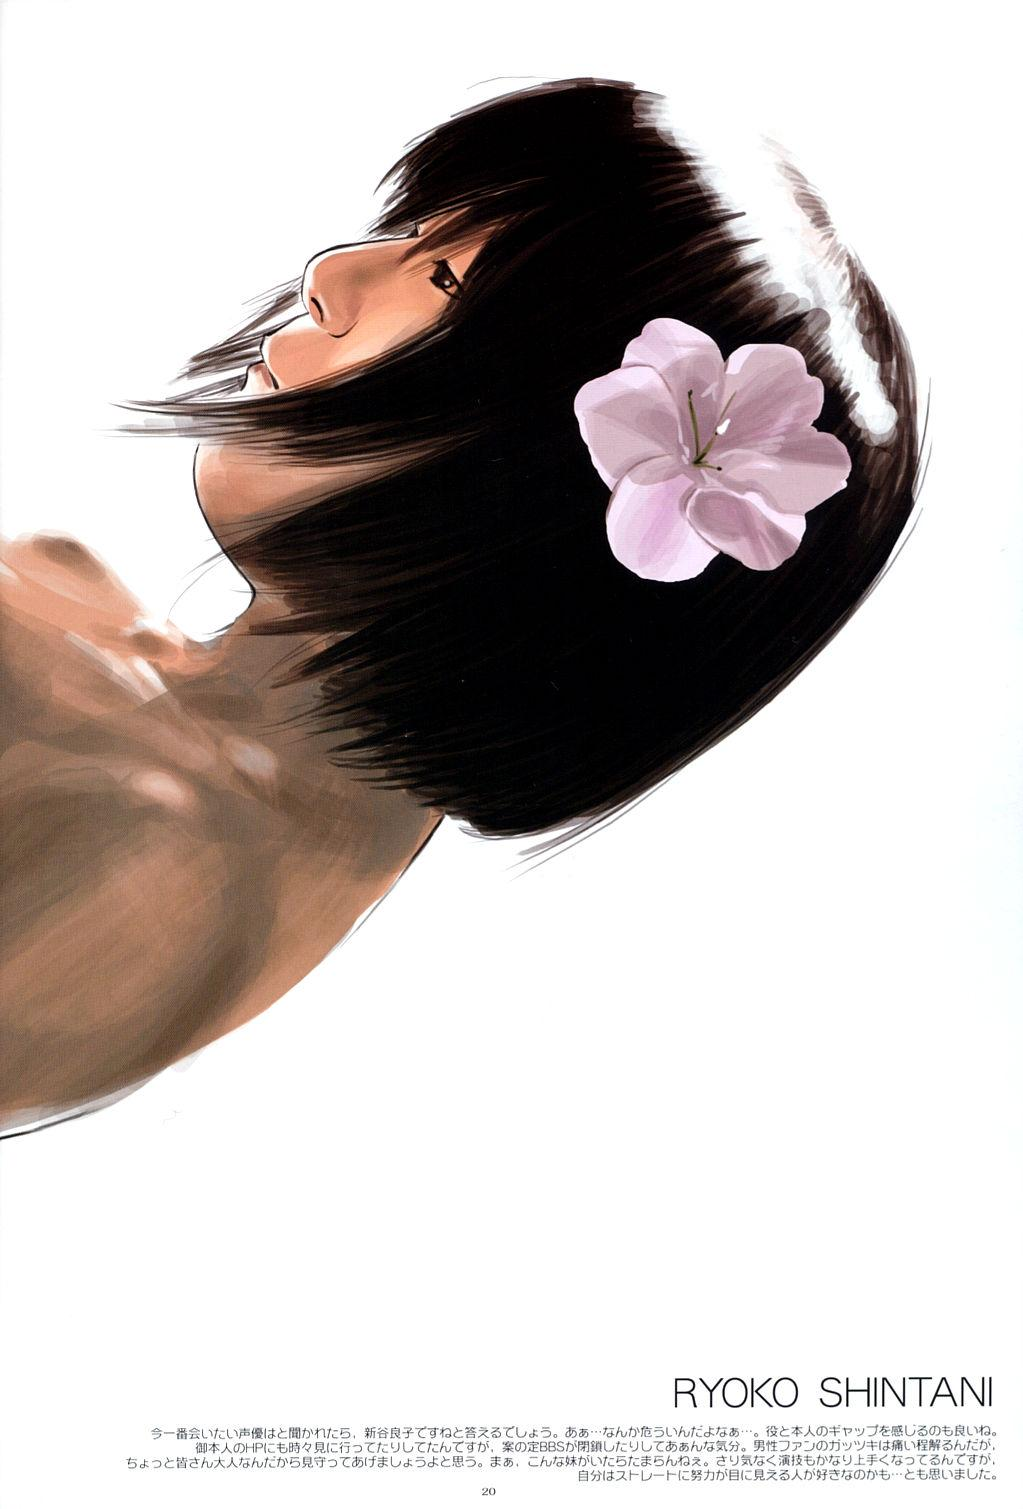 Kikan GIRLIE Vol.2 18